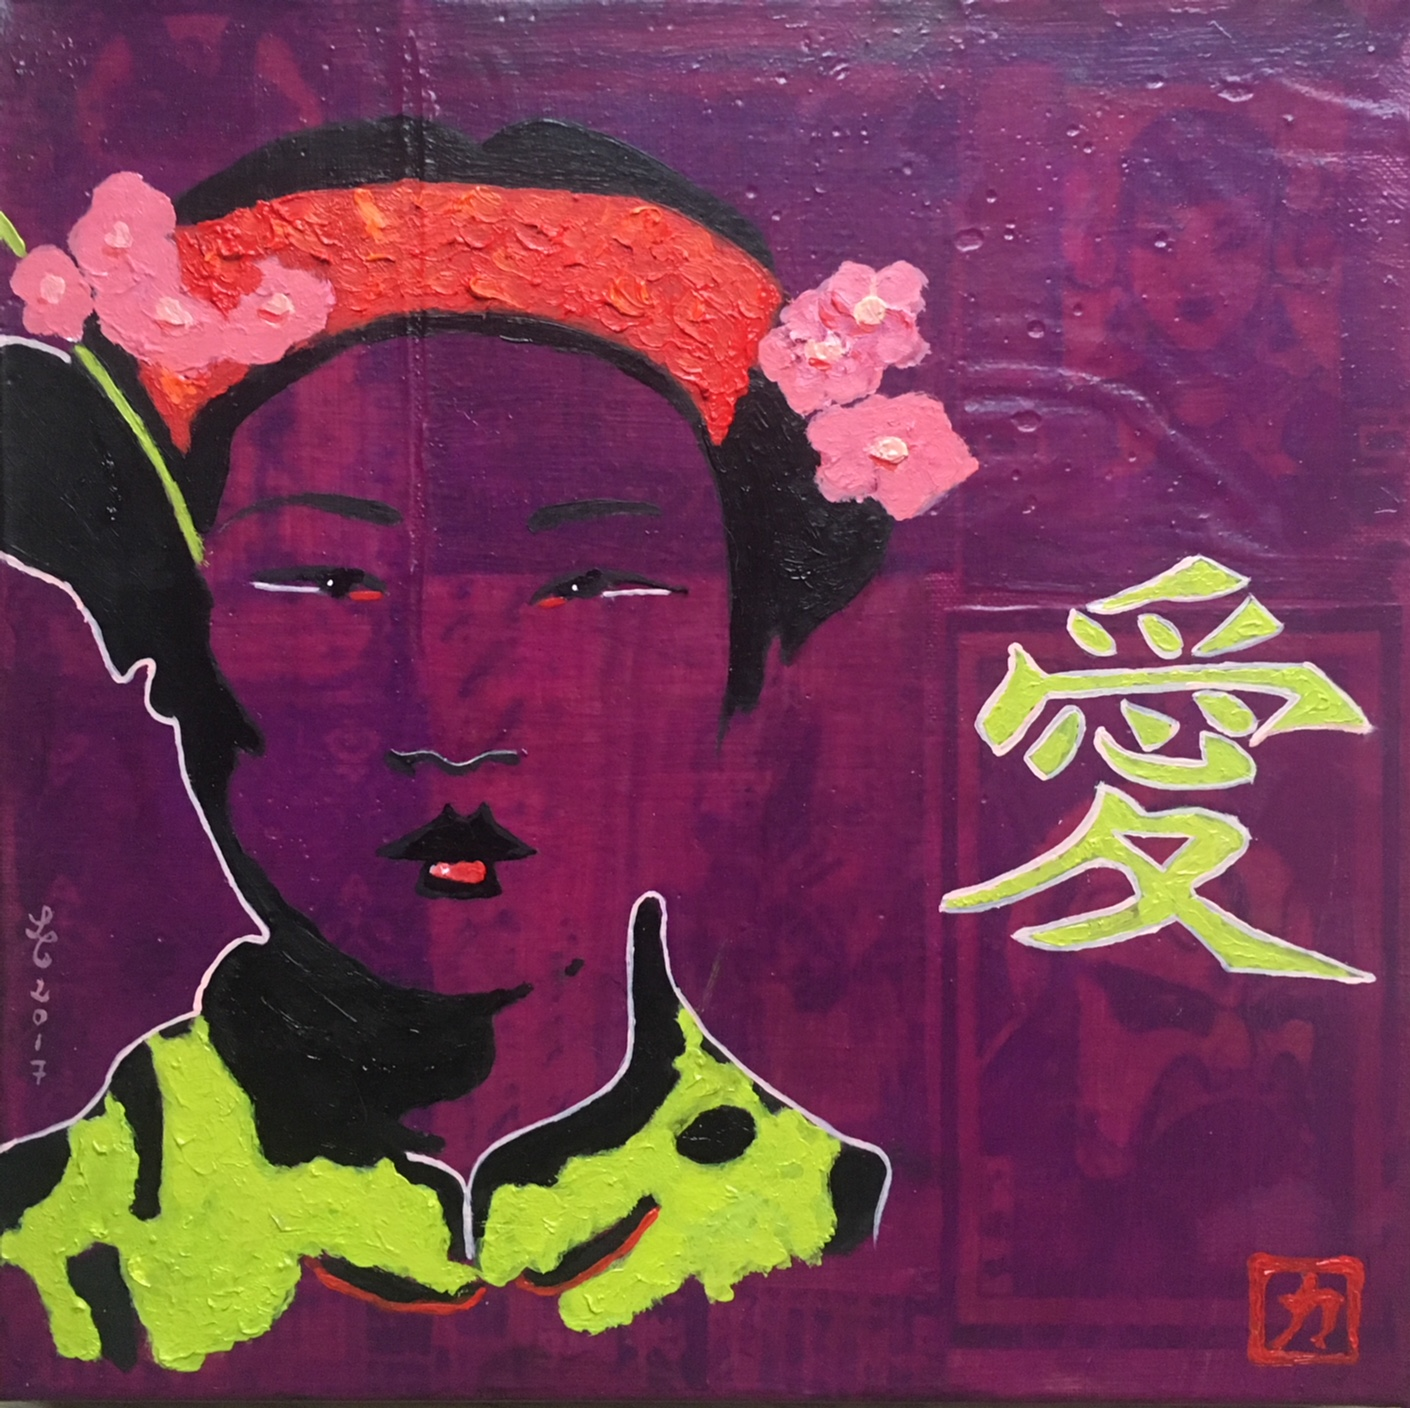 Sampuru III, 2017 | Oil on canvas | 30 x 30 cm | £360